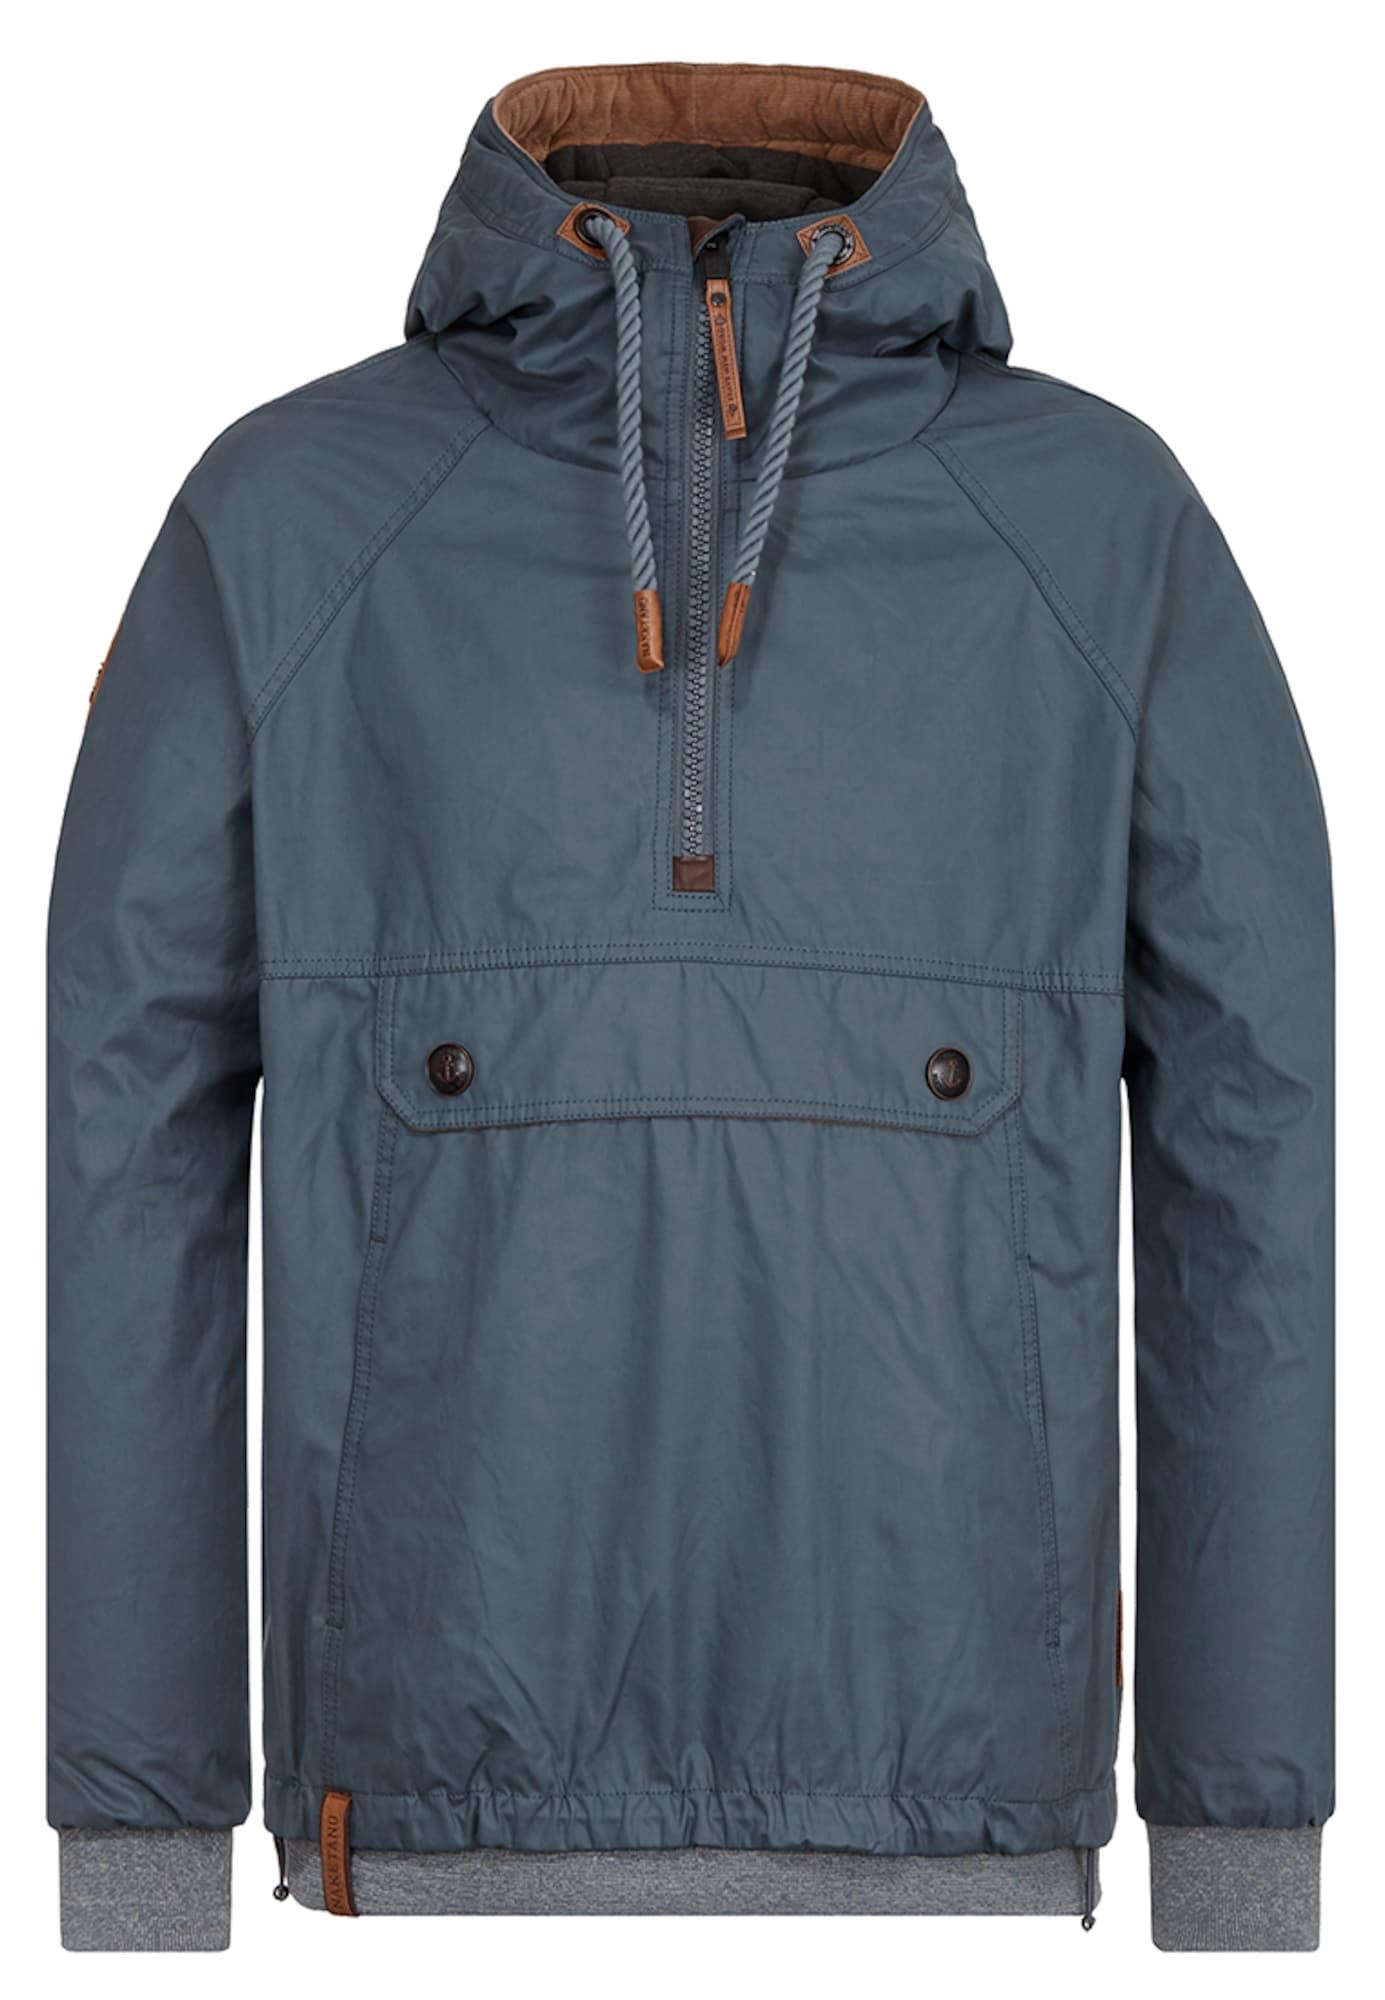 Zimní bunda Hartgekochte Eier chladná modrá Naketano